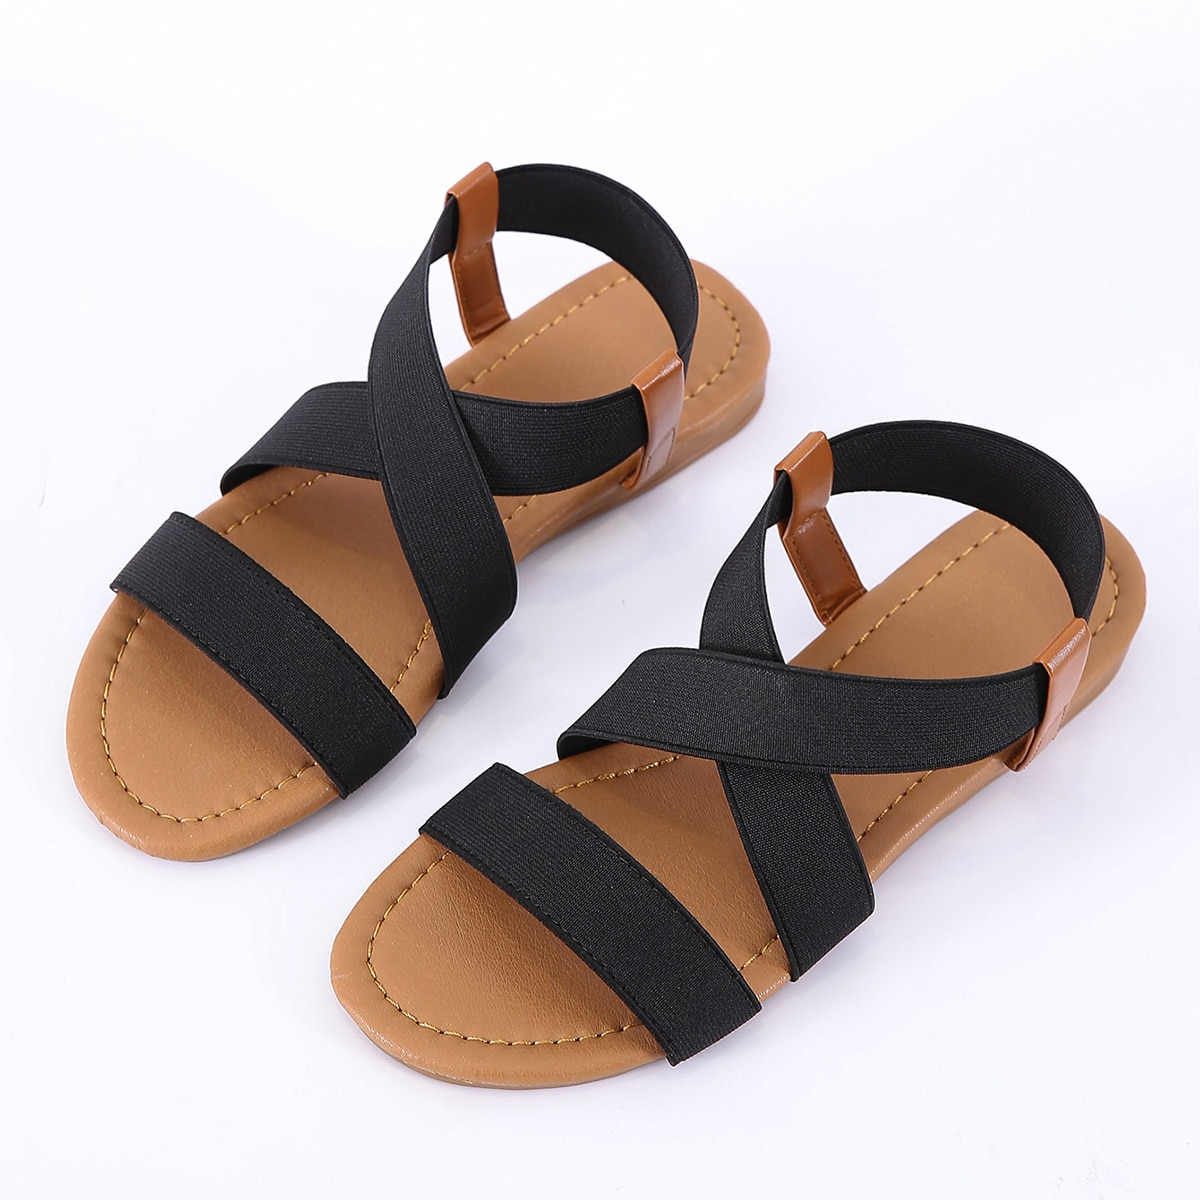 Минималистские сандалии